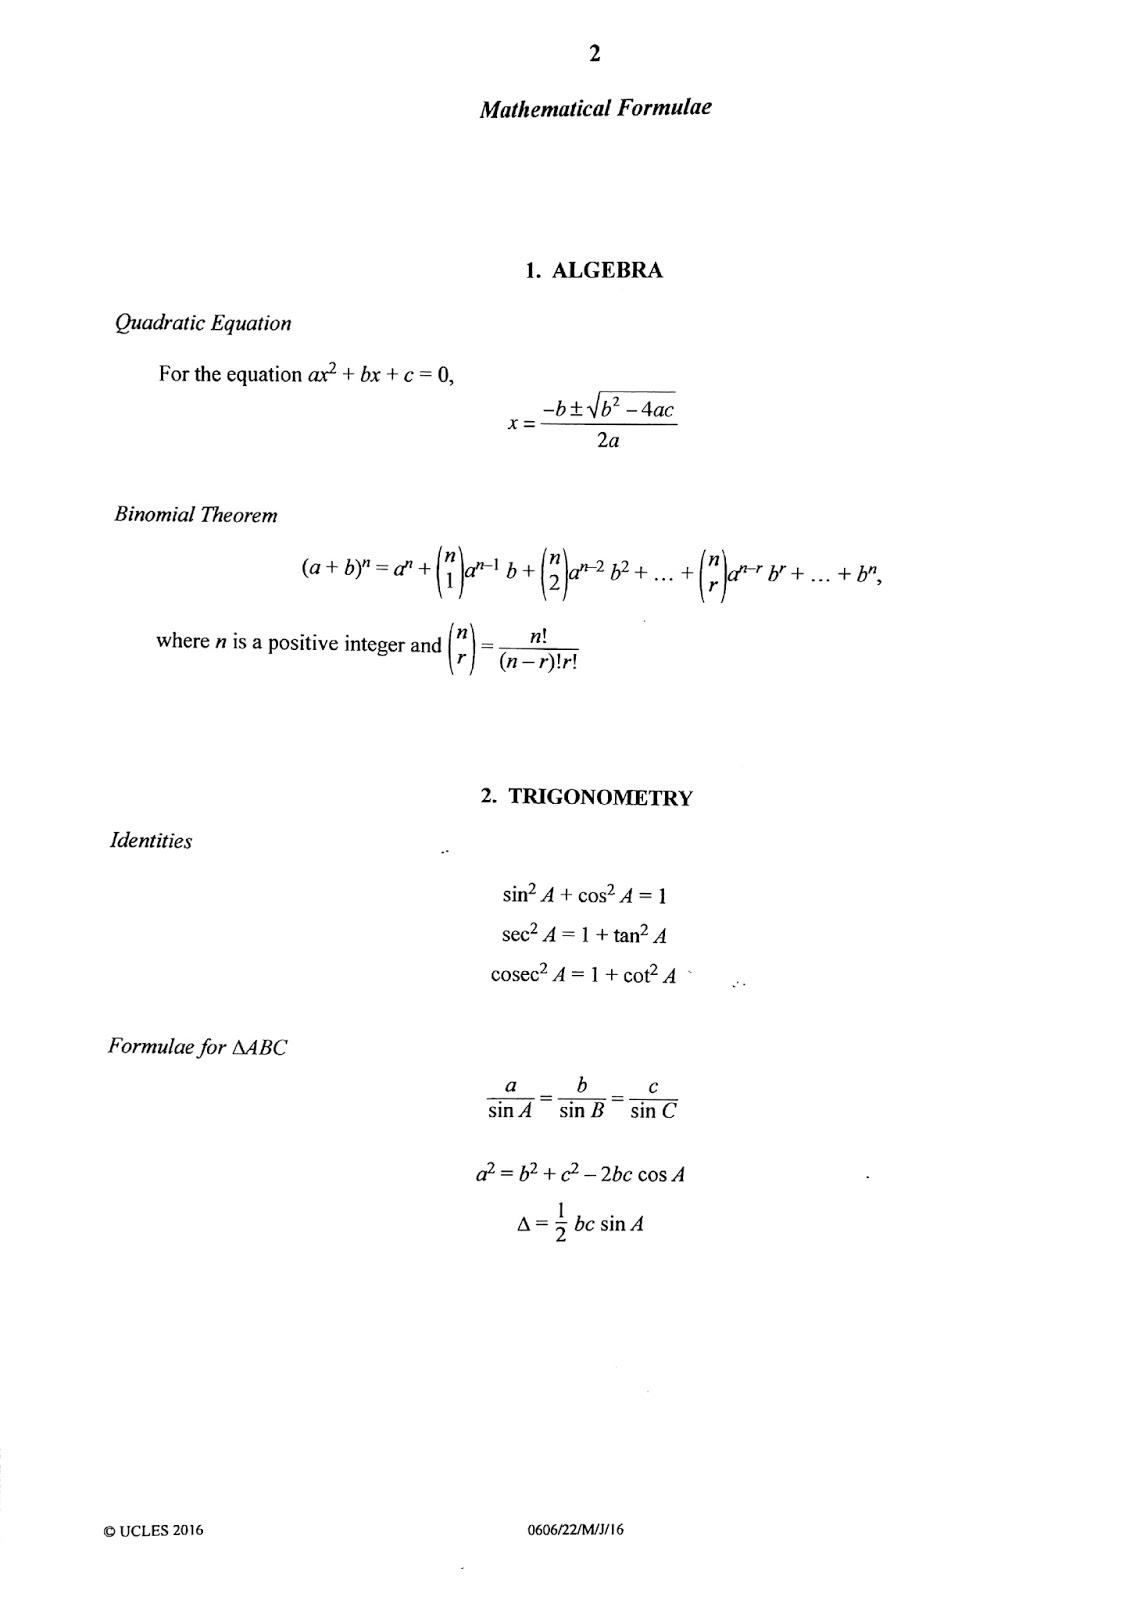 Igcse Add Maths Working Answers 22 Paper 2 May June